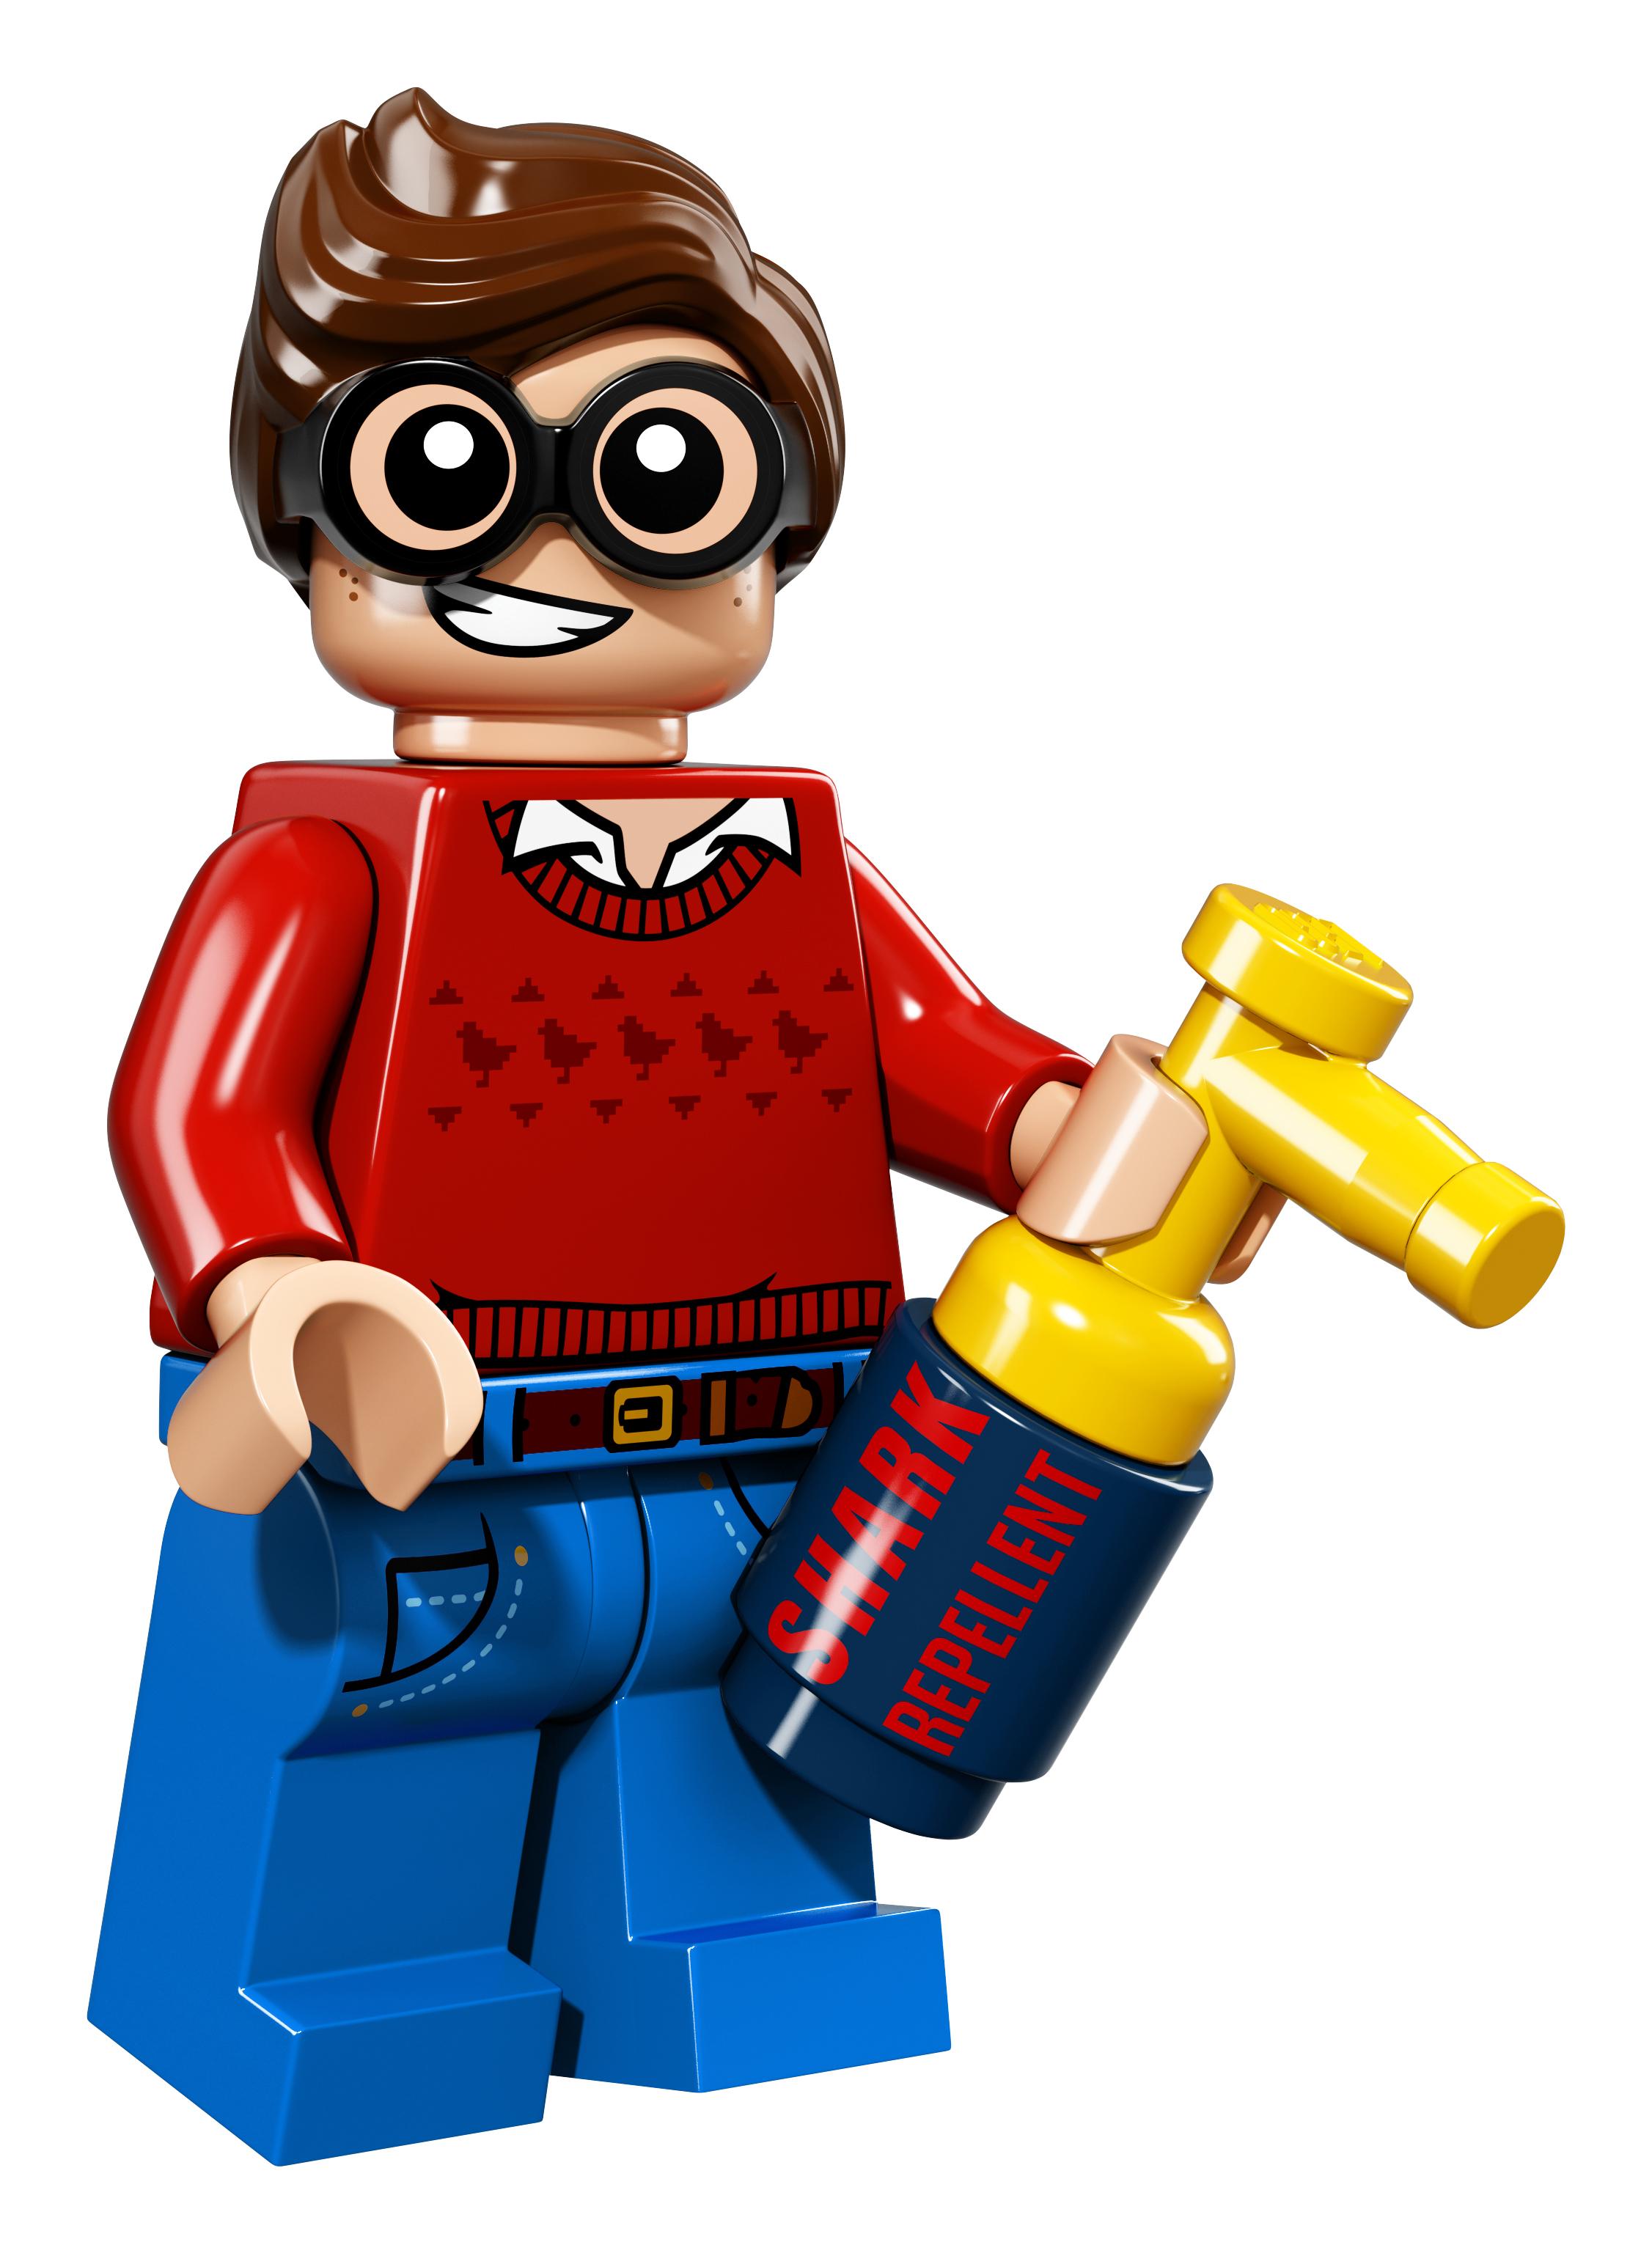 LEGO Batman Movie Minifigures.